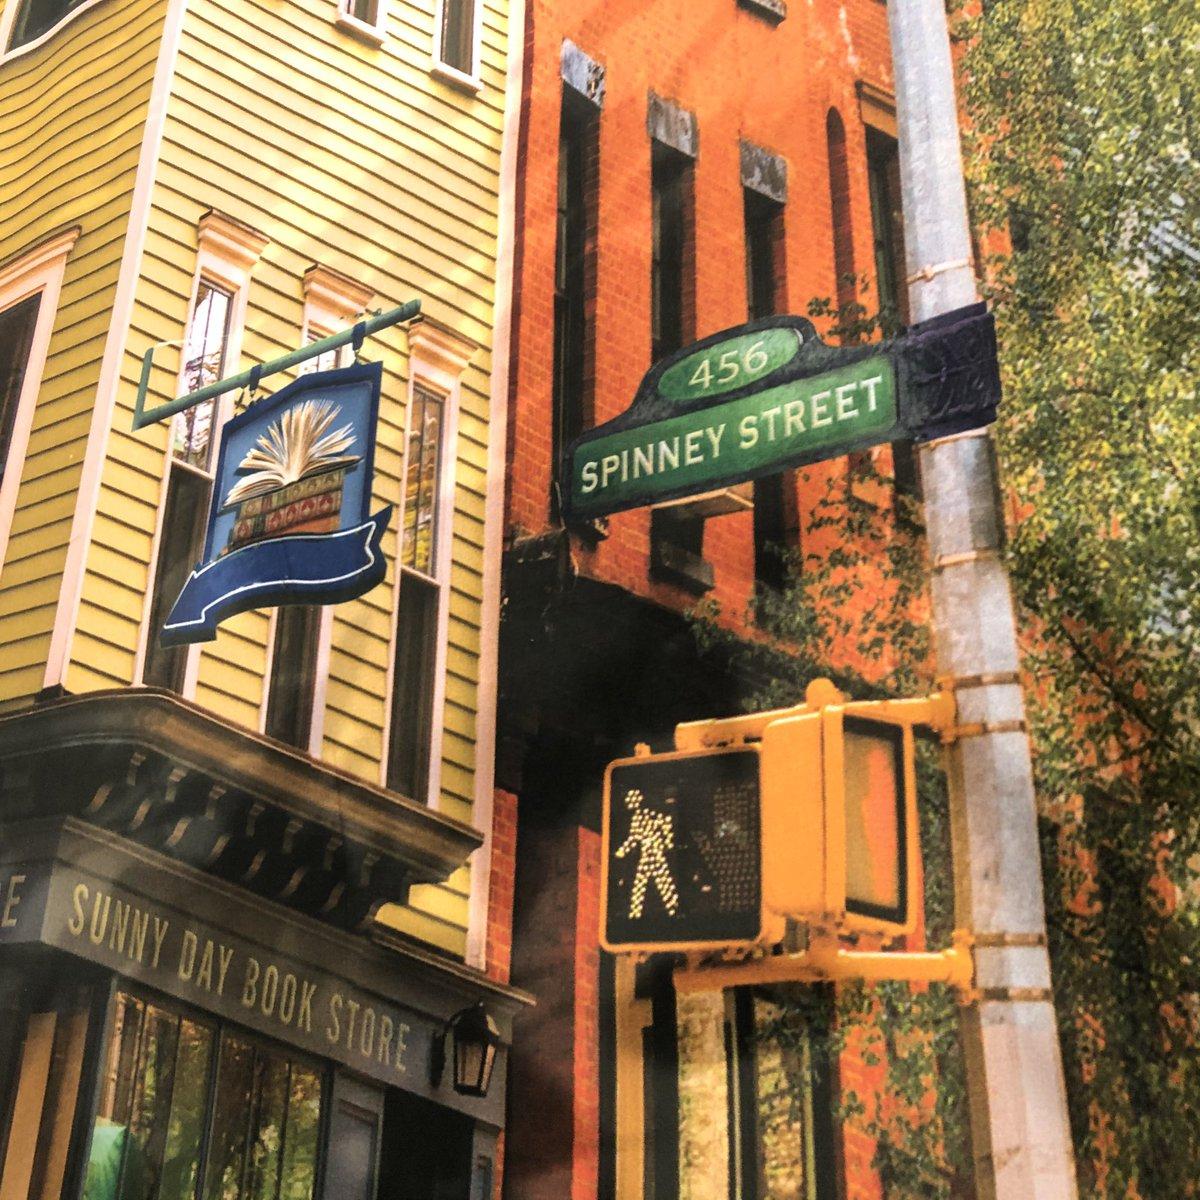 Seen today on Sesame Street... . @sesamestreet #SpinneyPlace #SesameStreet #setdesign #homage